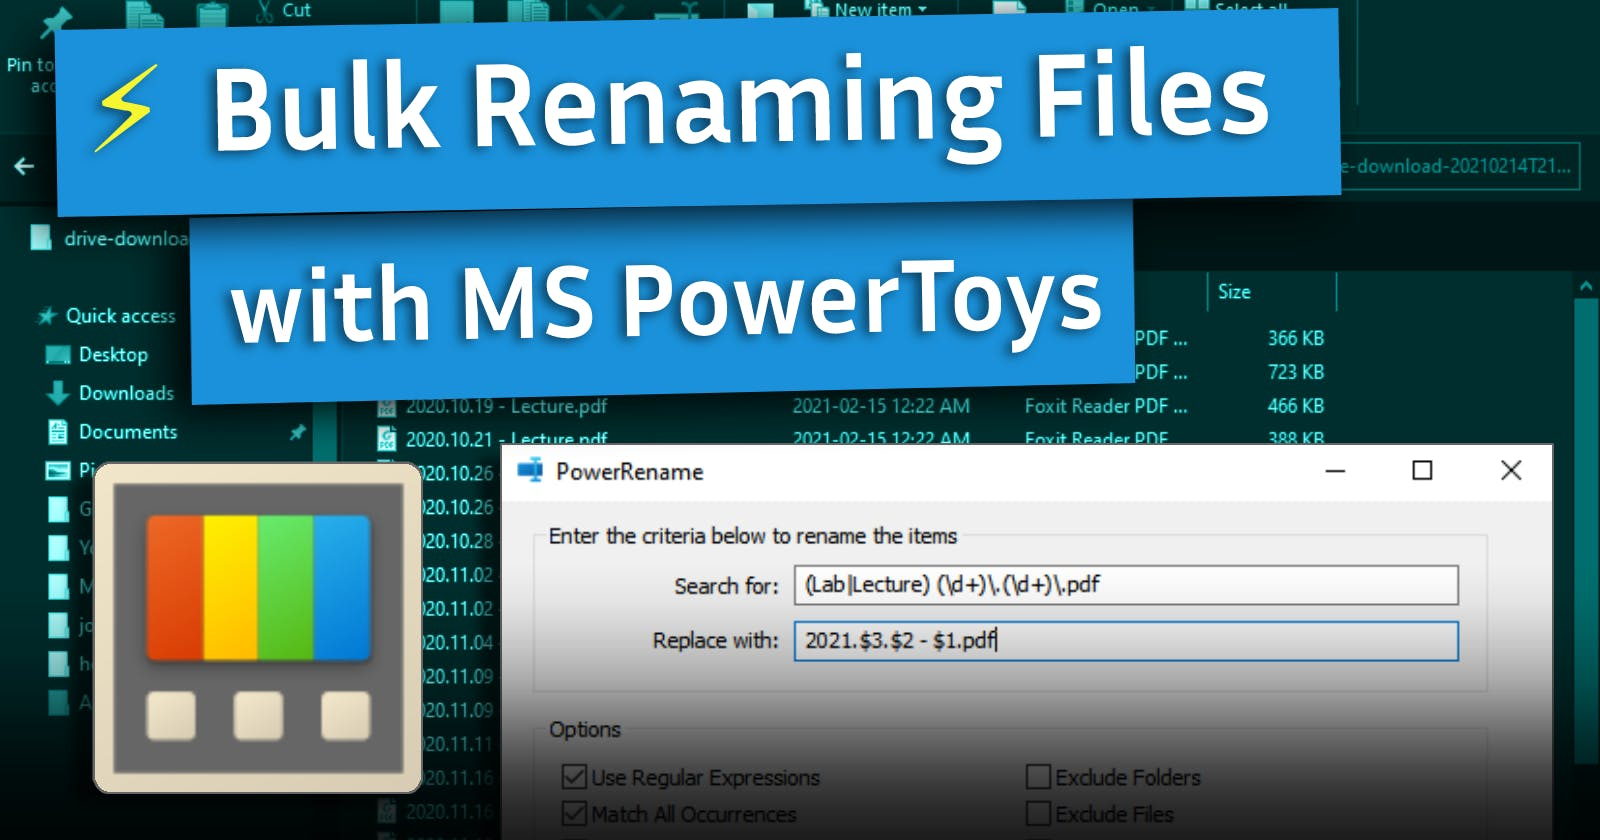 Easily Bulk Rename Files on Windows